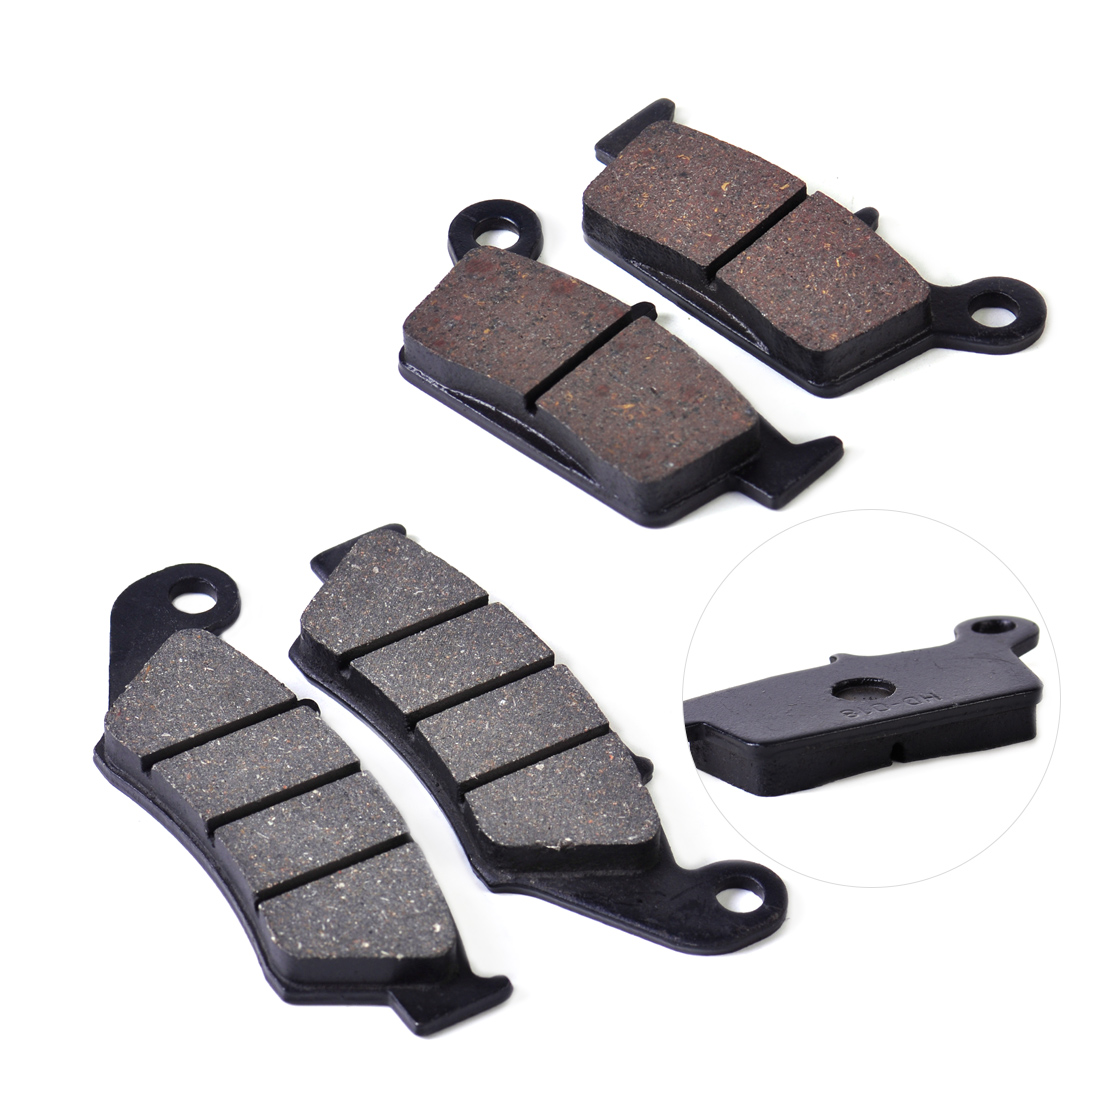 beler 2pcs Front or Rear Brake Pads Fit for Suzuki RM125 RM250 Honda XR250R CR125R Yamaha YZ125 YZ250 Kawasaki KX500 KLX650R